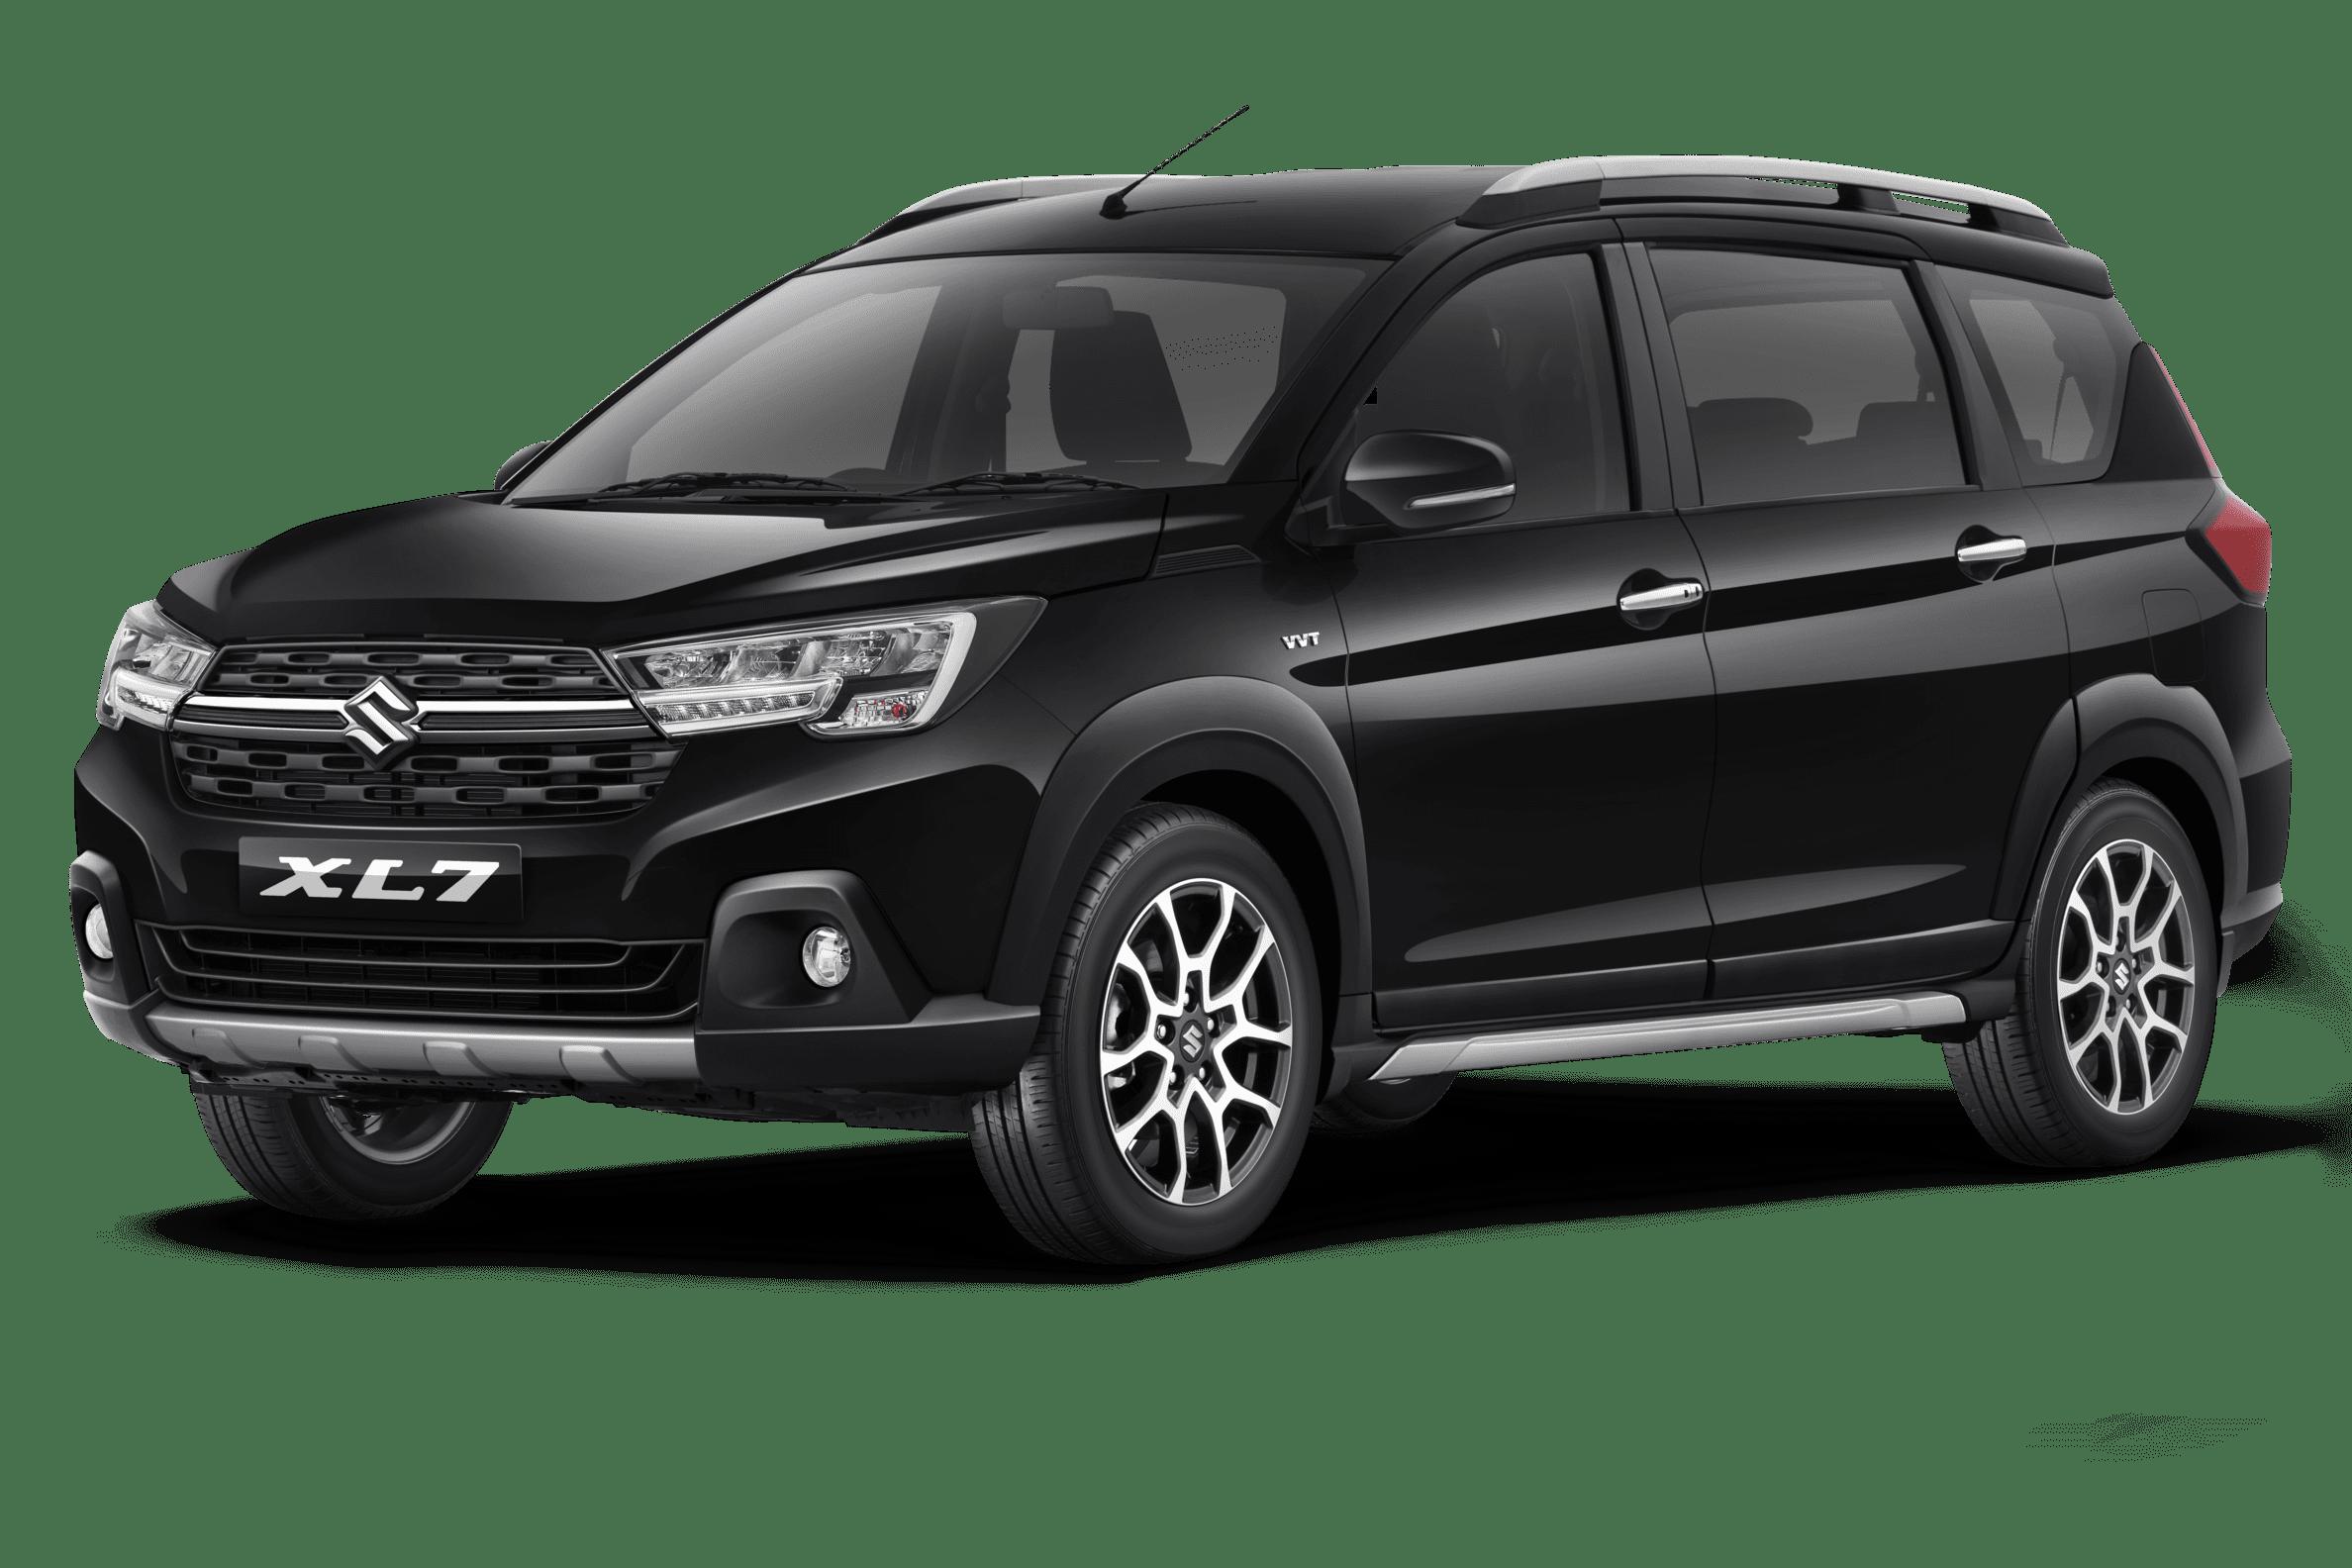 Suzuki XL7 Beta Prime Cool Black